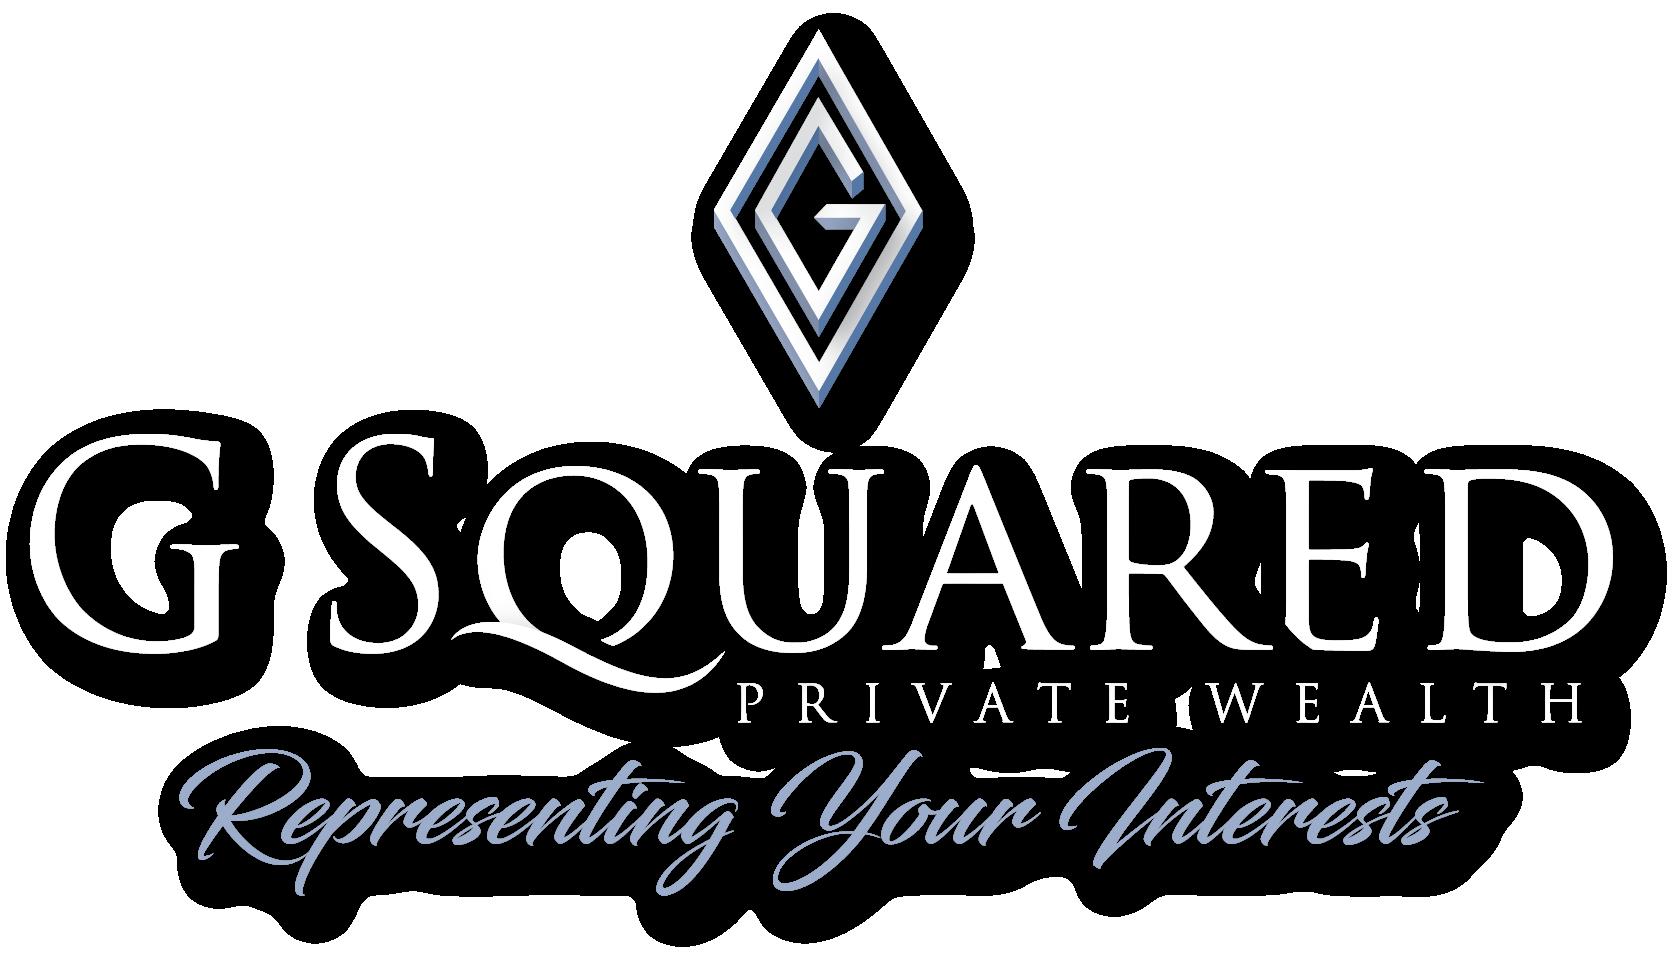 G Squared Private Wealth